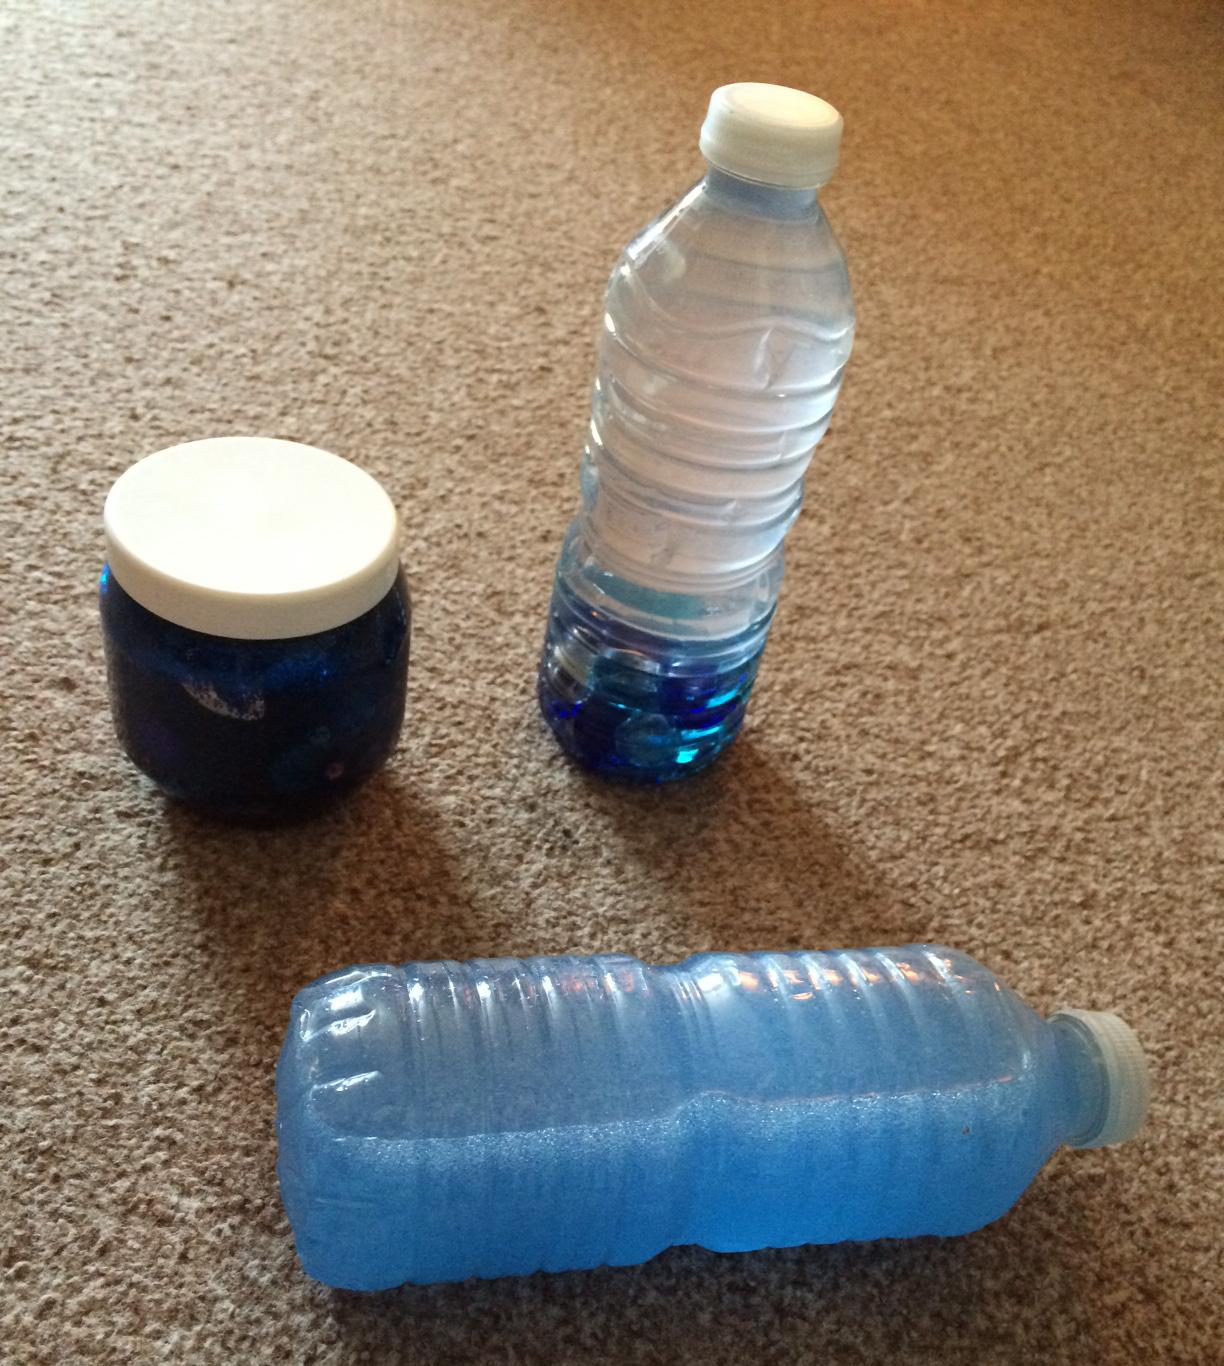 Aquarium themed sensory bottles